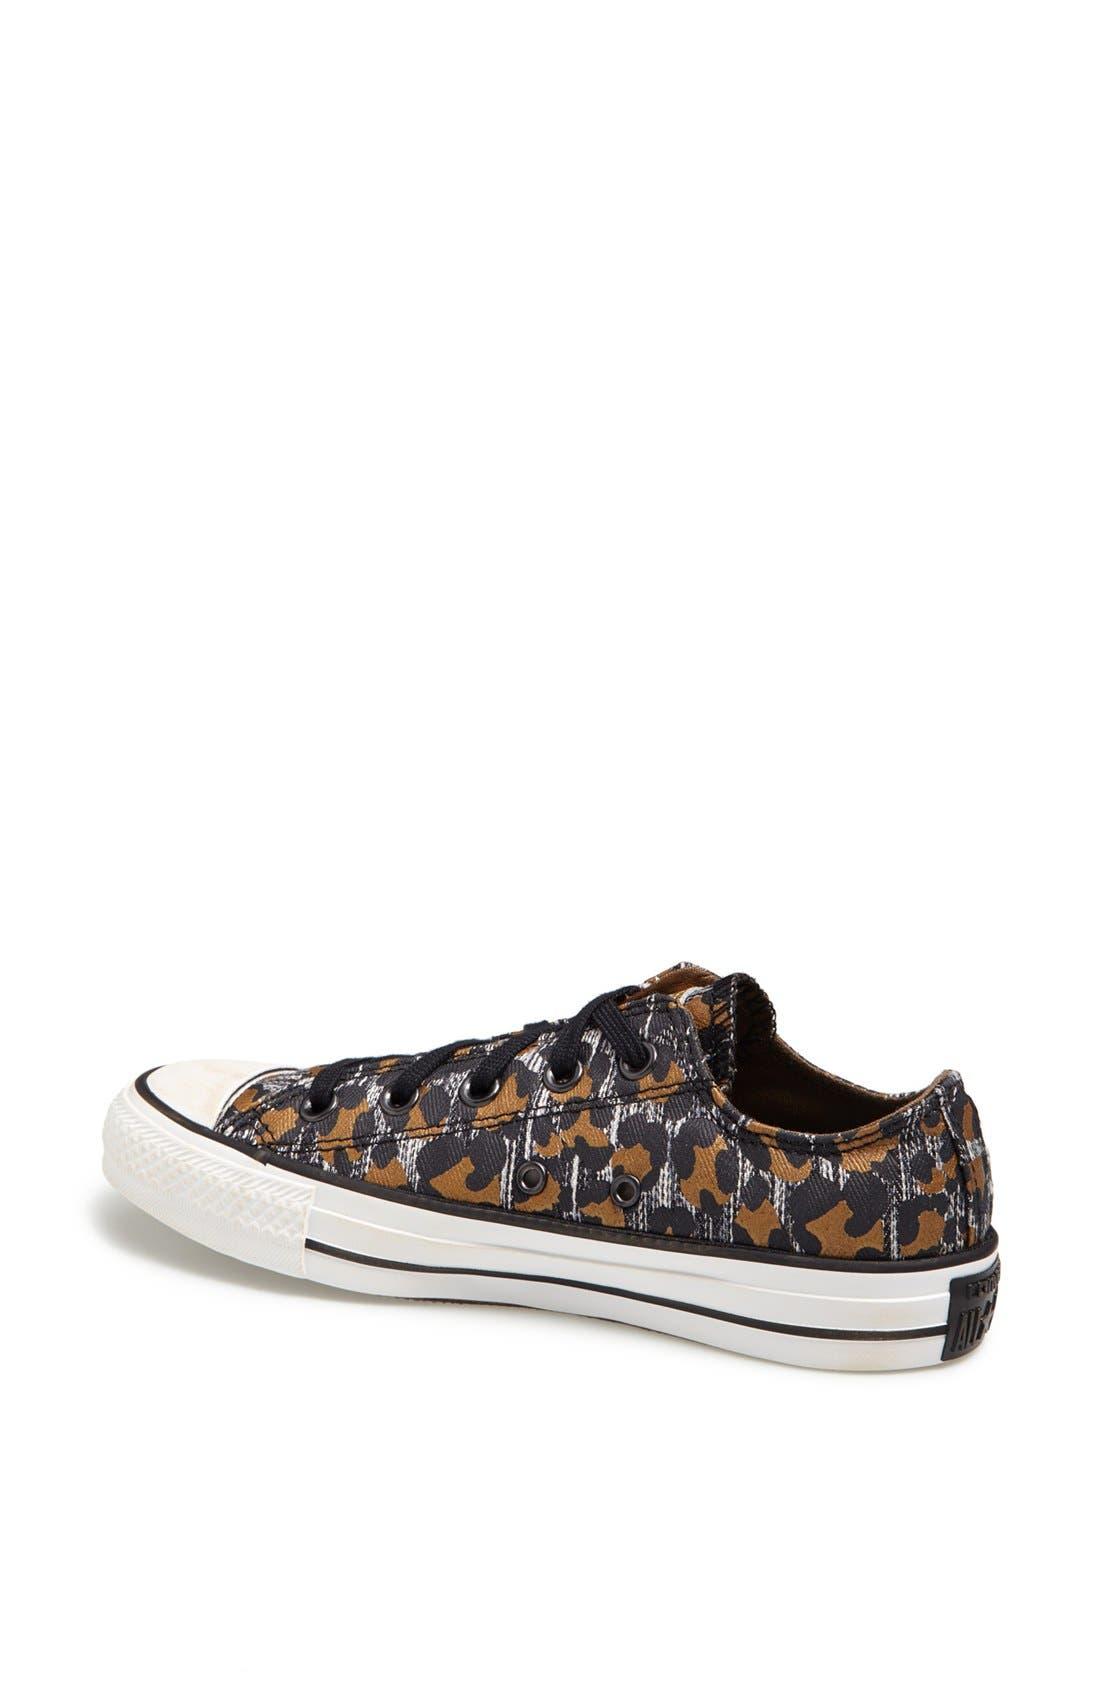 Alternate Image 2  - Converse Chuck Taylor® All Star® Low Print Sneaker (Women)